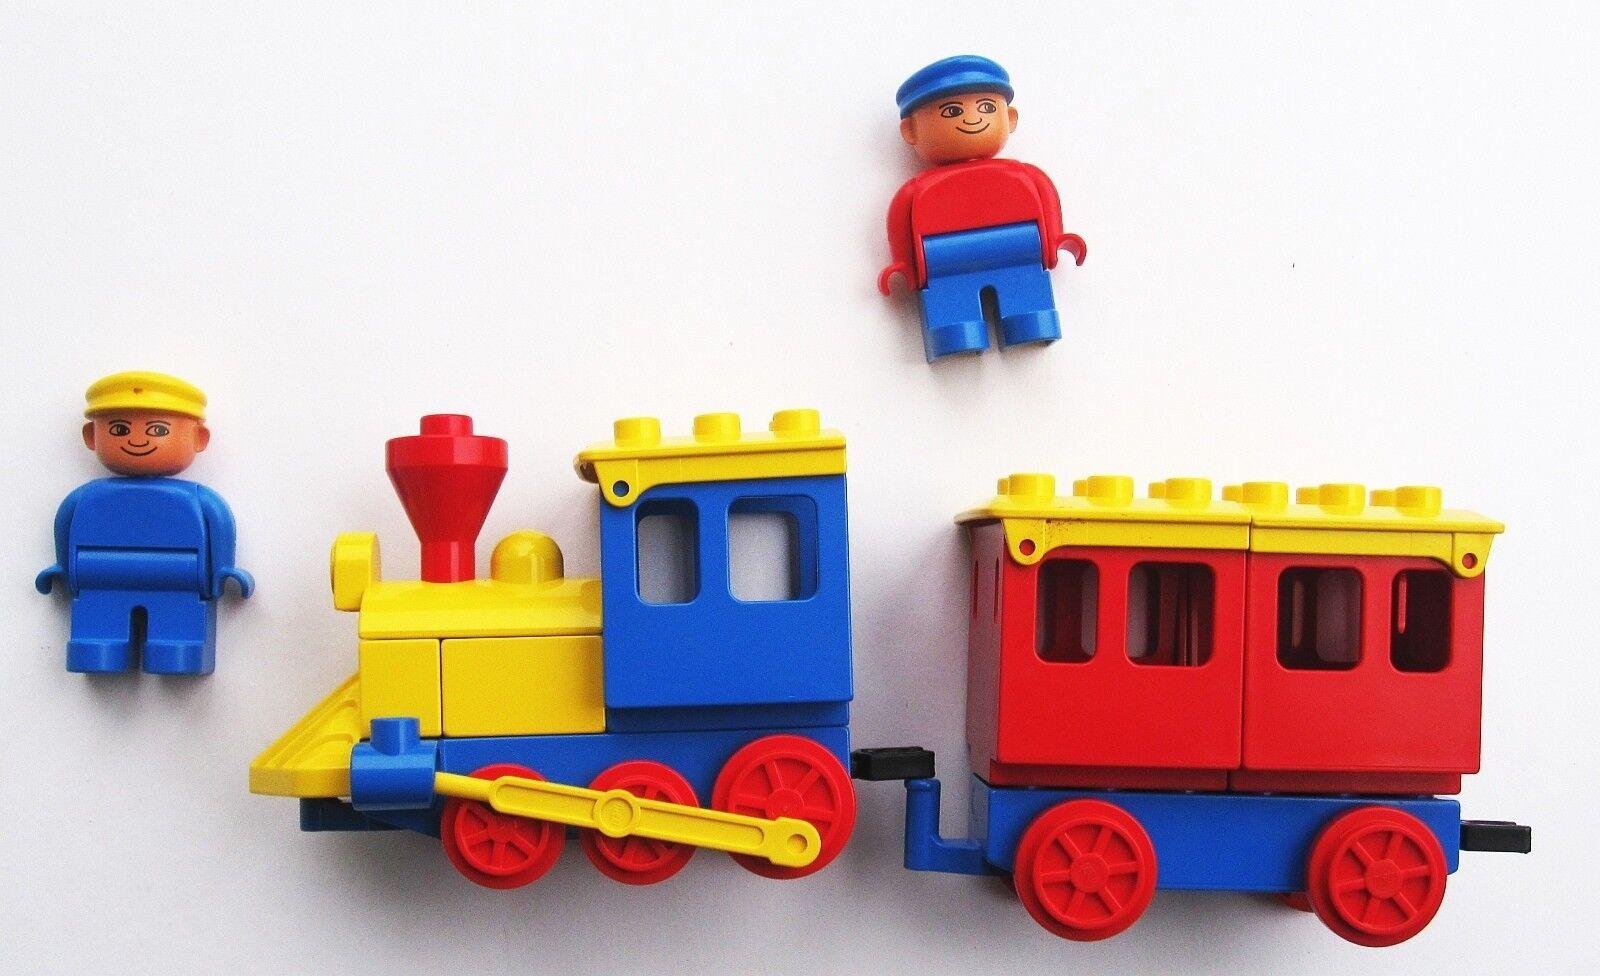 1983 Lego Duplo Play Passenger Train  2705 Vintage No Shovel GREAT Condition